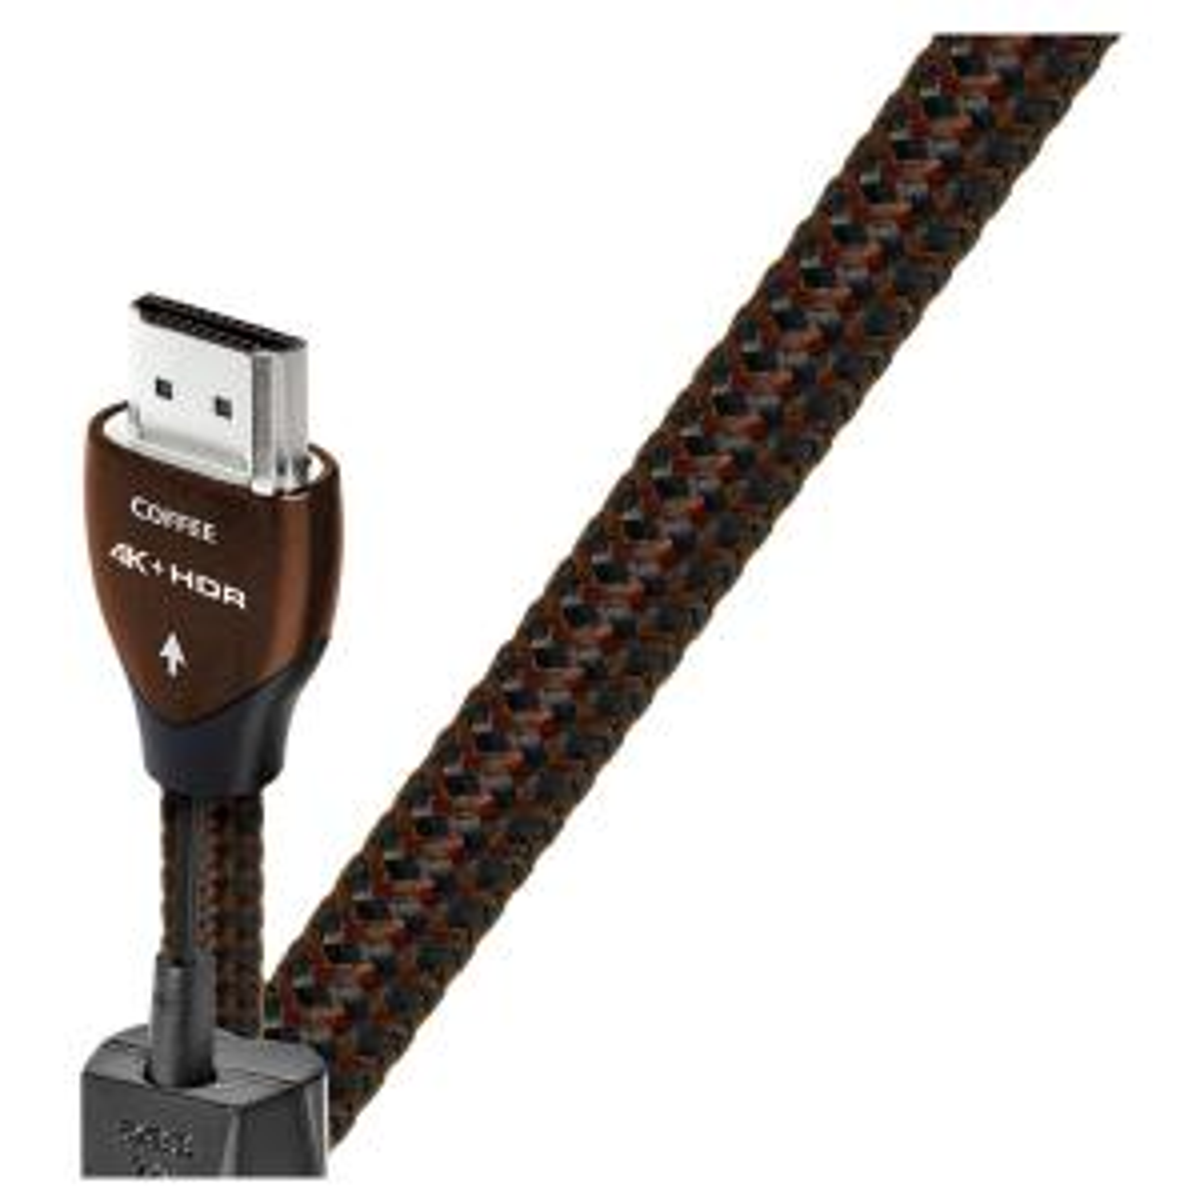 HDMI кабель AudioQuest HDMI Chocolate Braid, 4.0 м